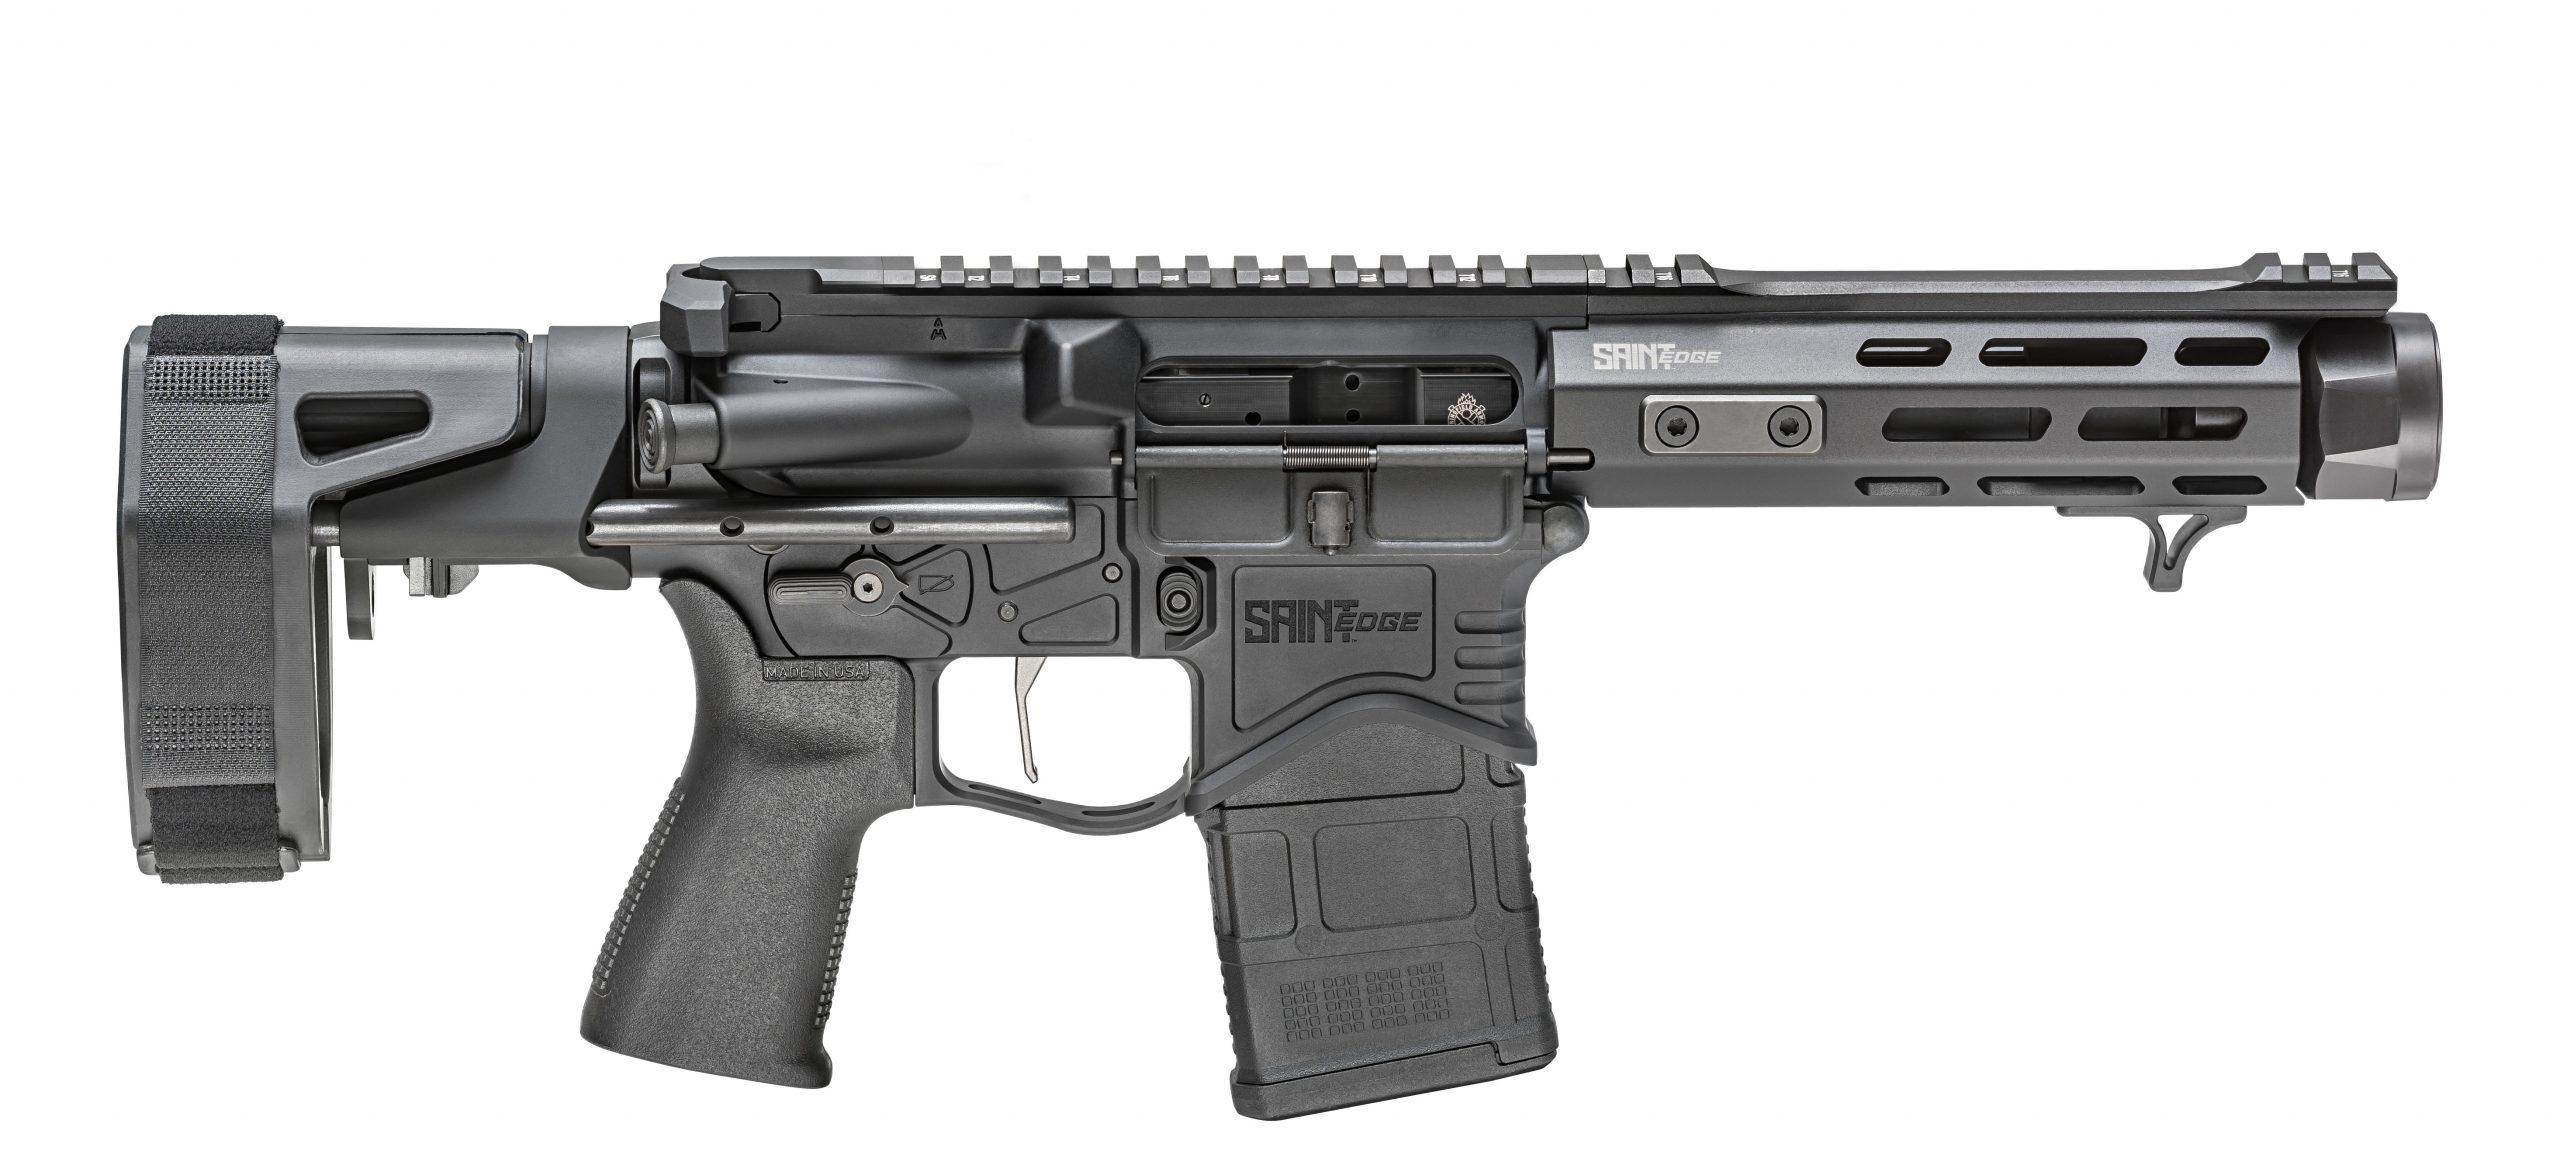 Springfield Armory Saint Edge PDW Pistol 223 Rem | 5.56 NATO